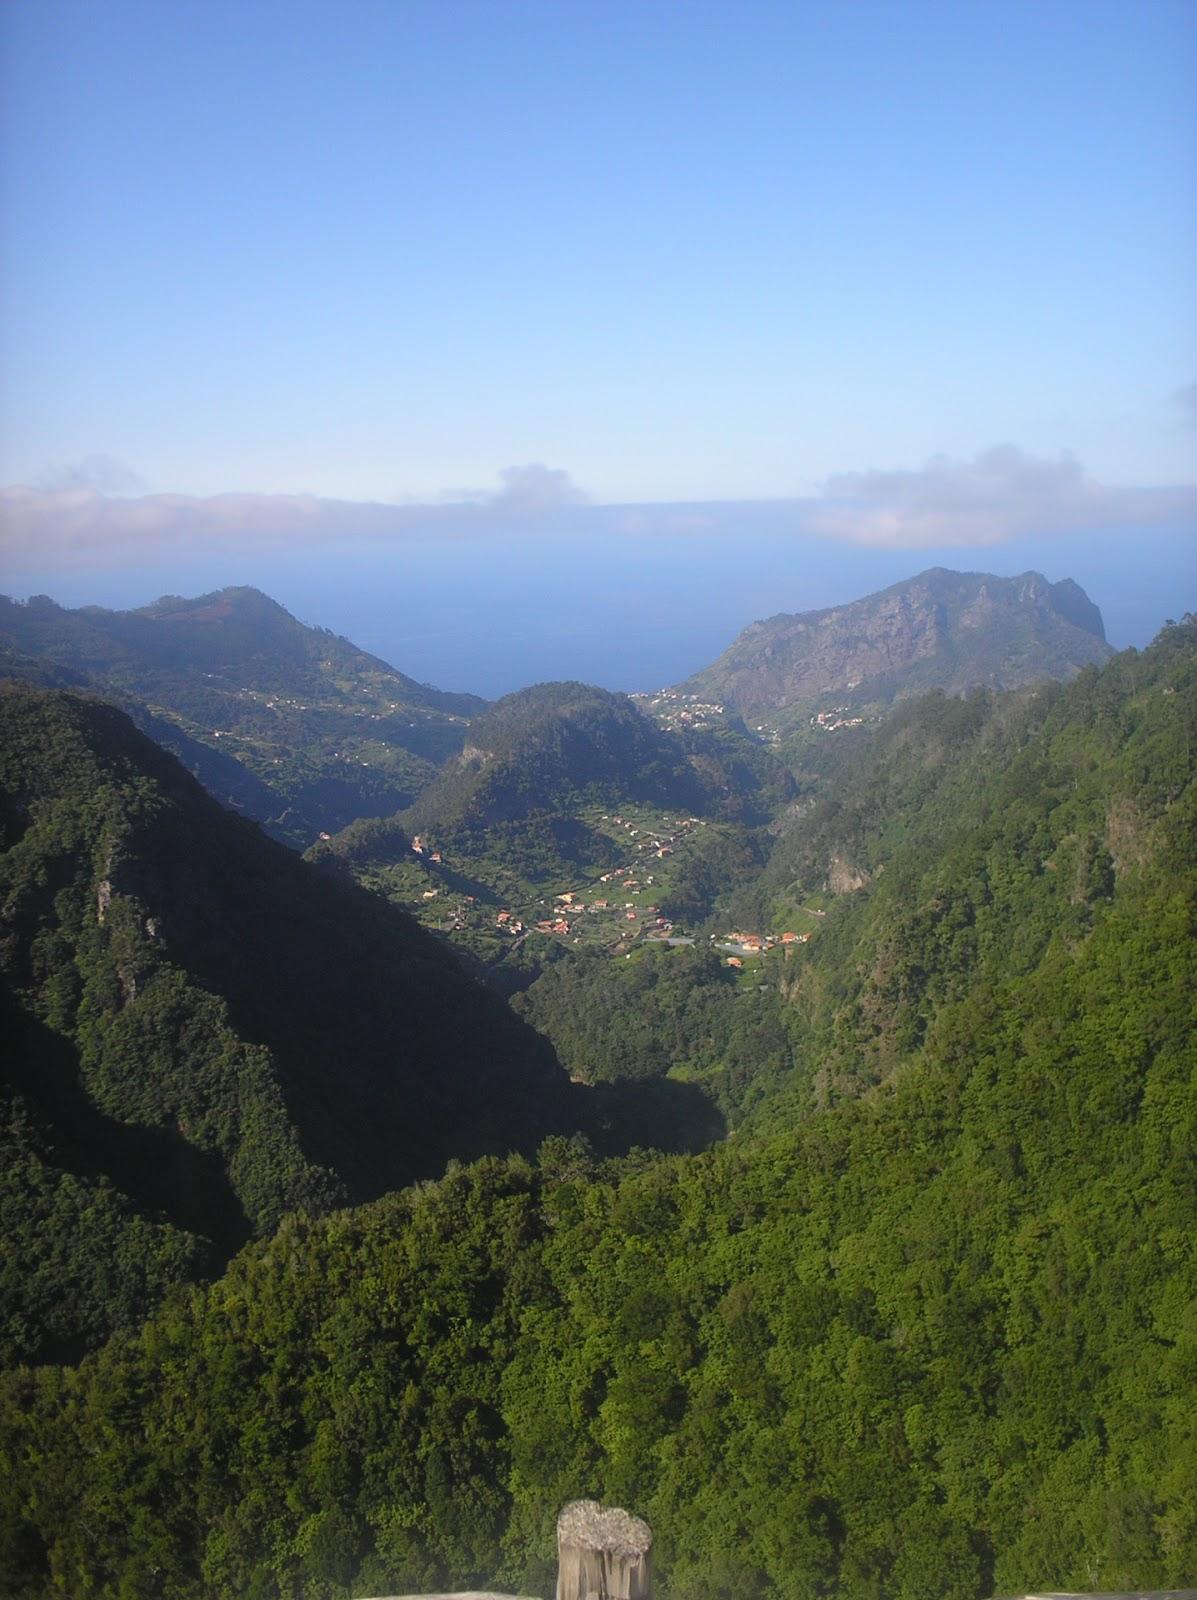 "(<img alt=""Madeira View"">)"